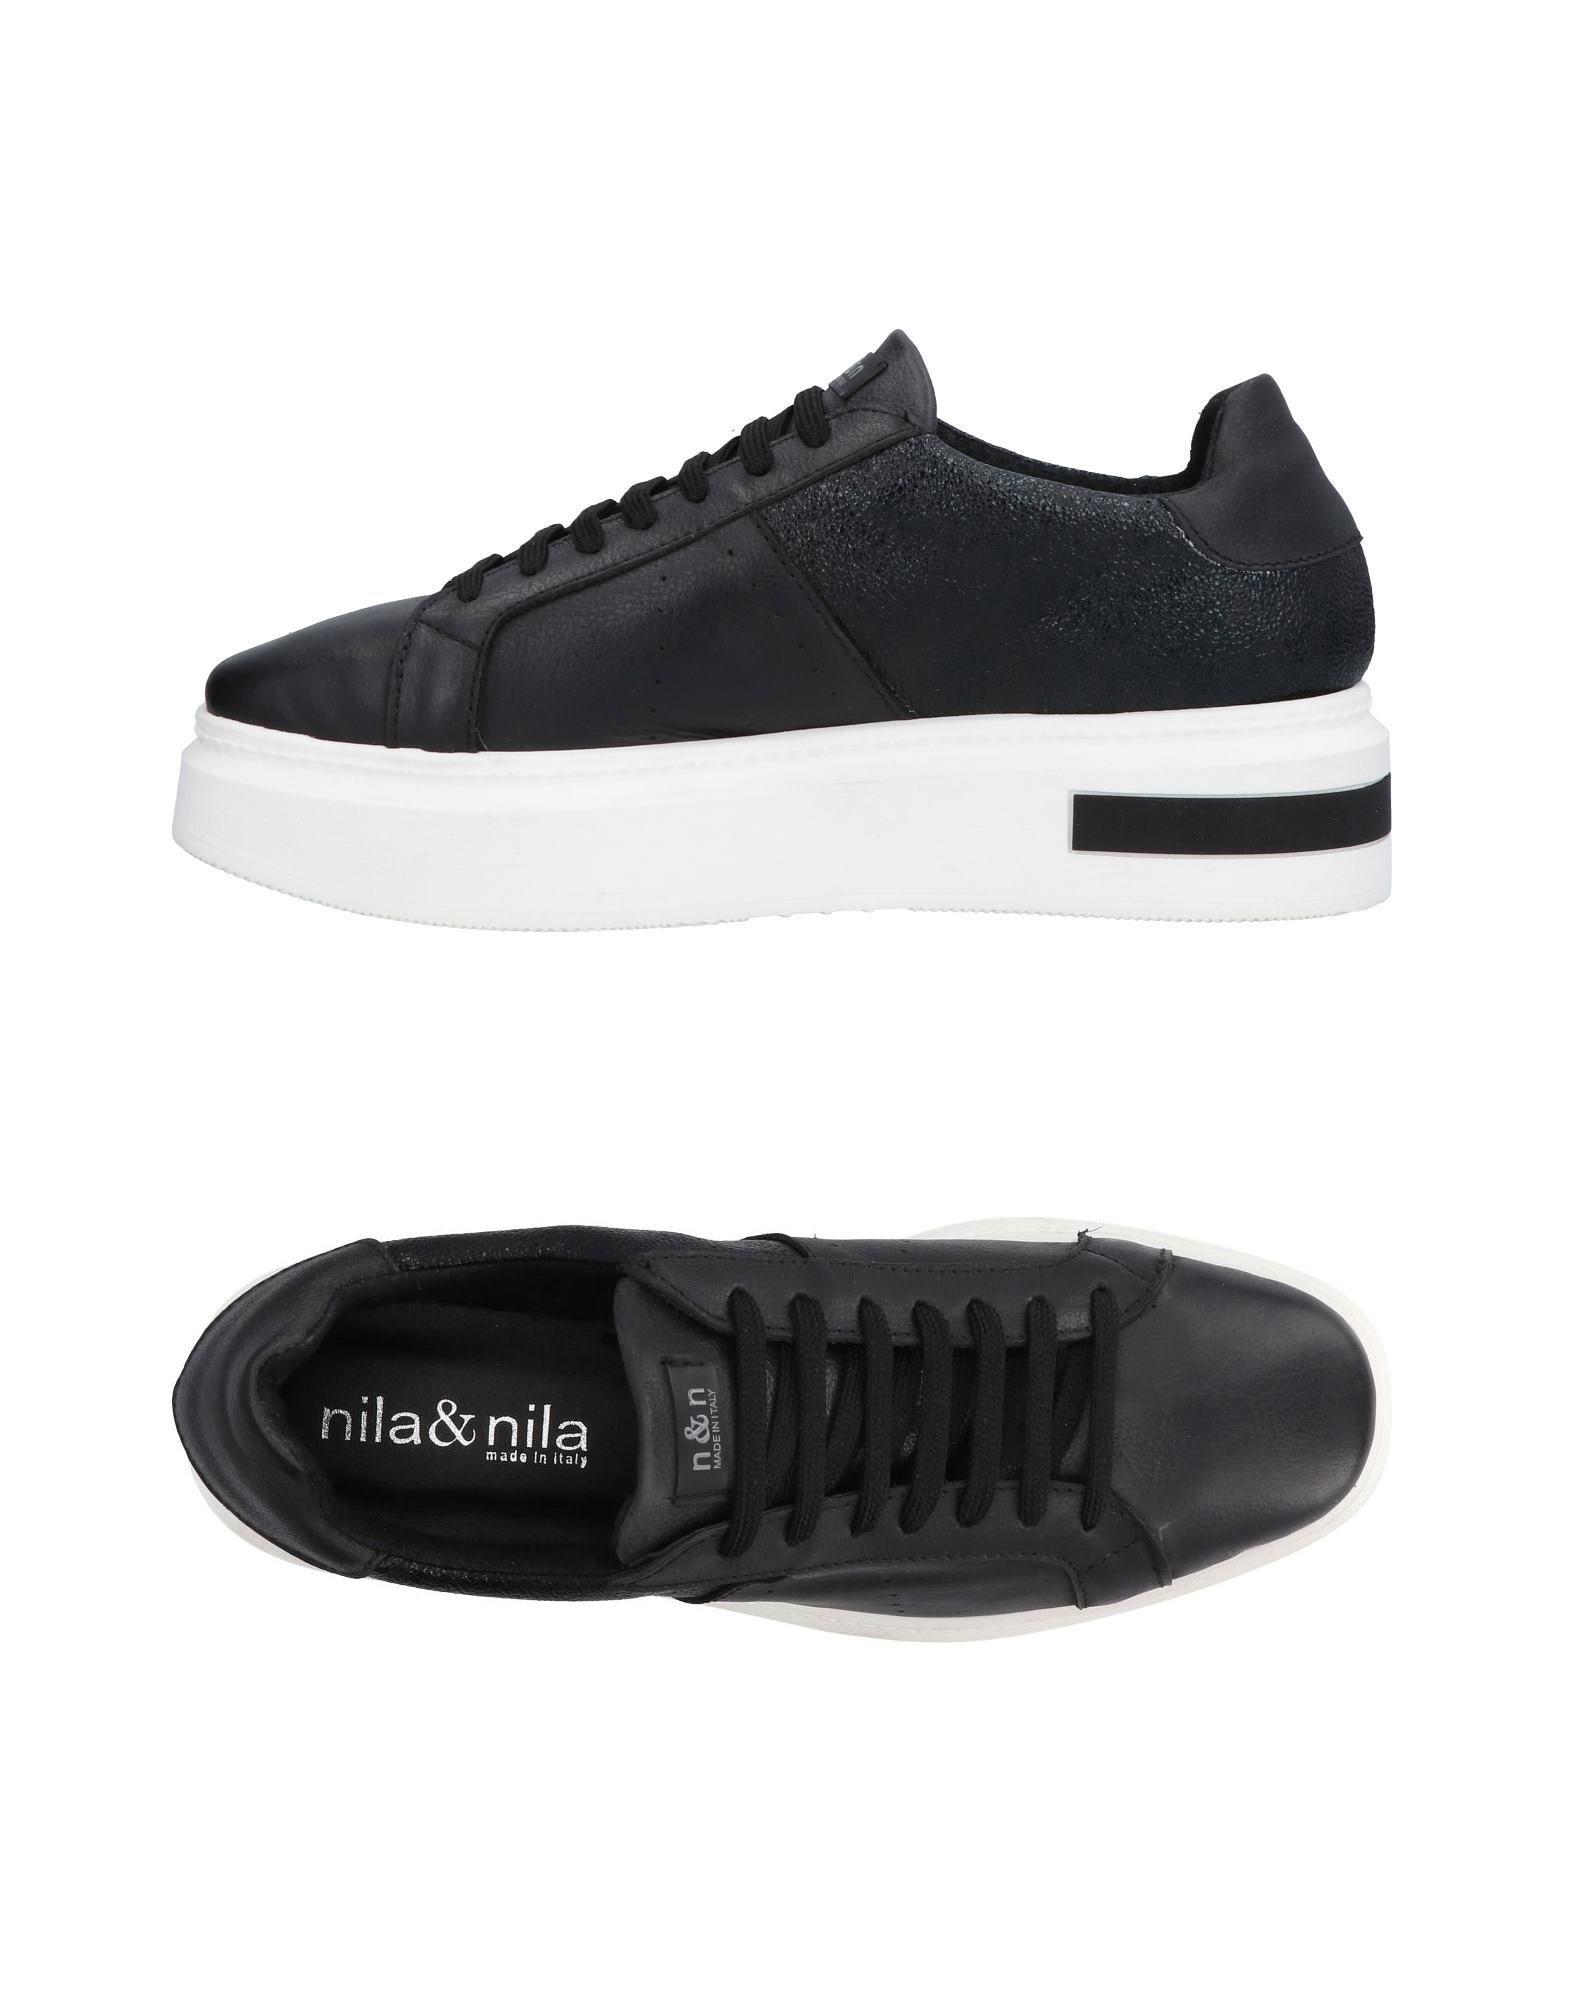 Nila & Nila Sneakers Qualität Damen  11474830OH Gute Qualität Sneakers beliebte Schuhe 6fd296